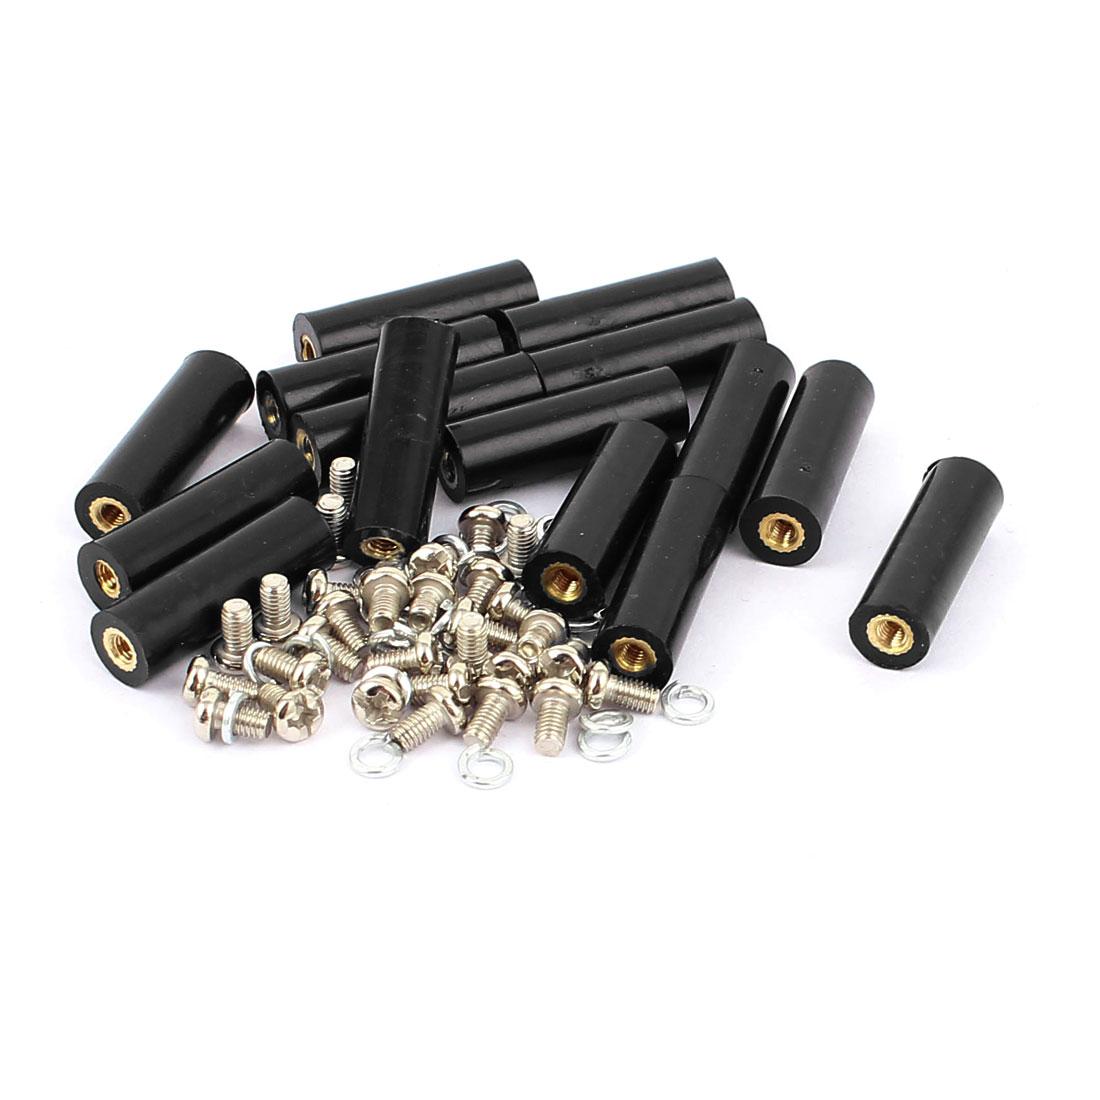 15 Pcs M3 Brass Insert Female Thread 8x25mm Insulated Standoff Terminals